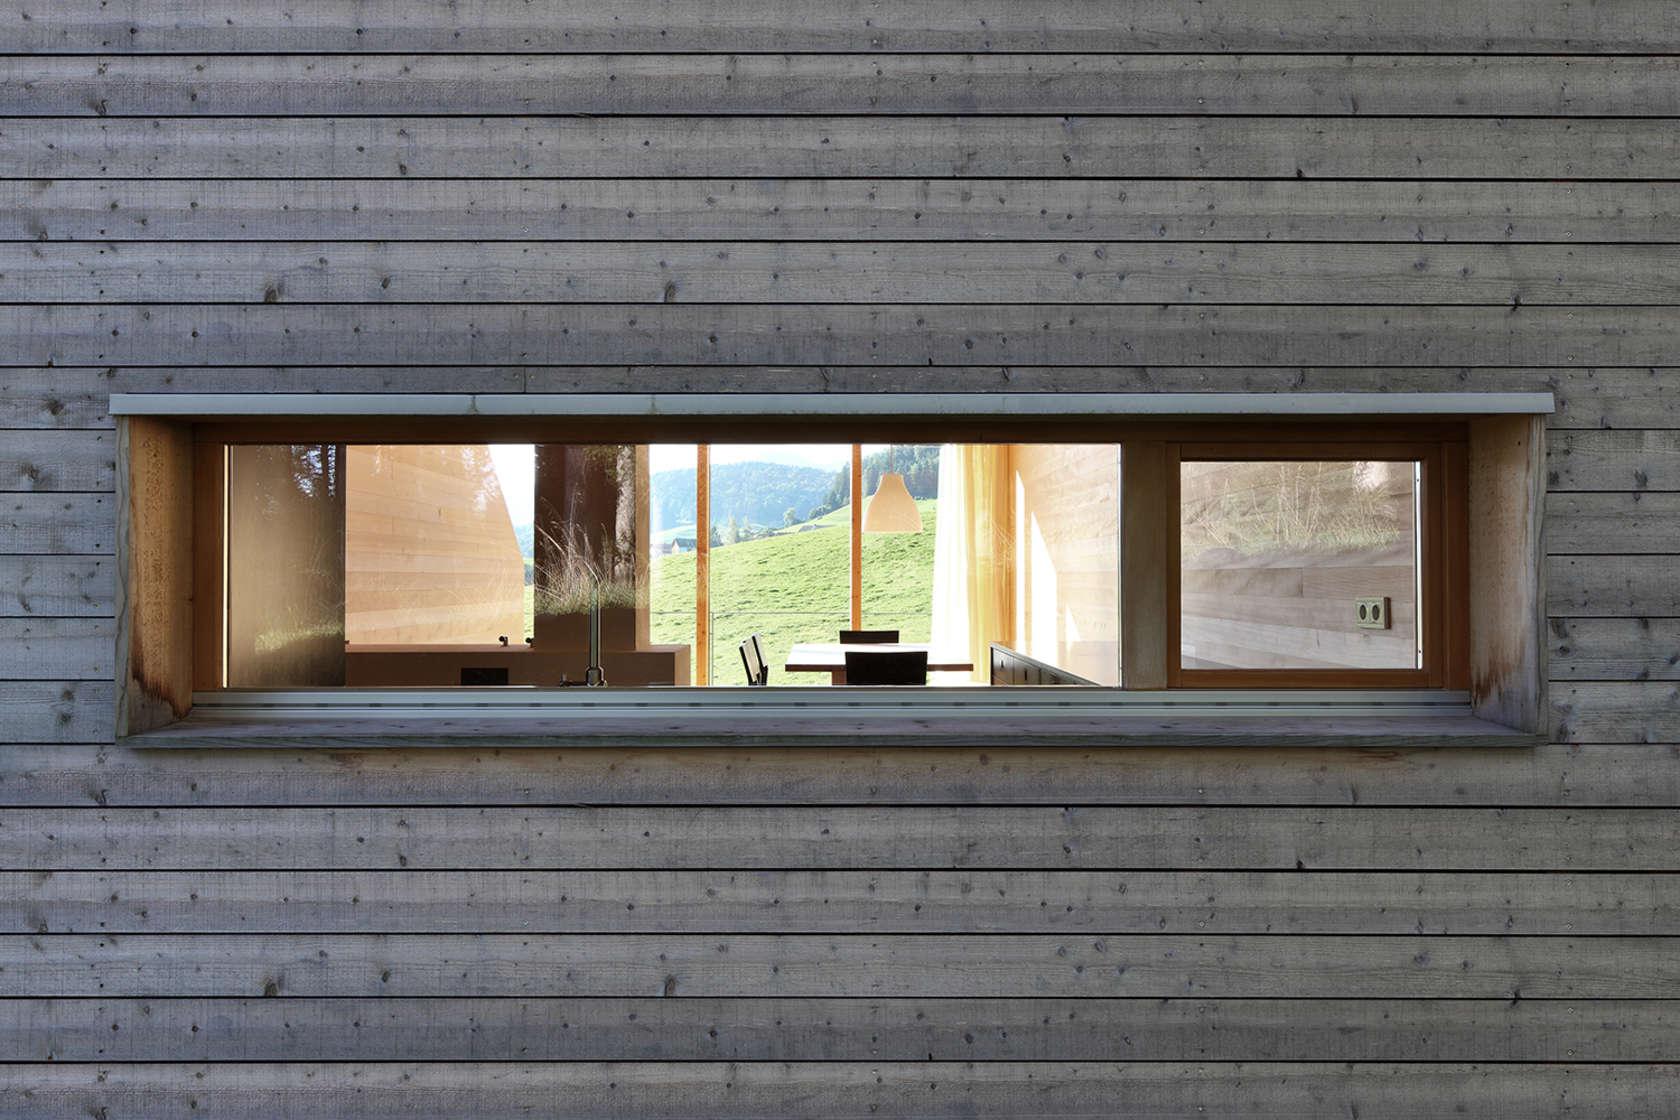 yonder architektur und design architizer. Black Bedroom Furniture Sets. Home Design Ideas